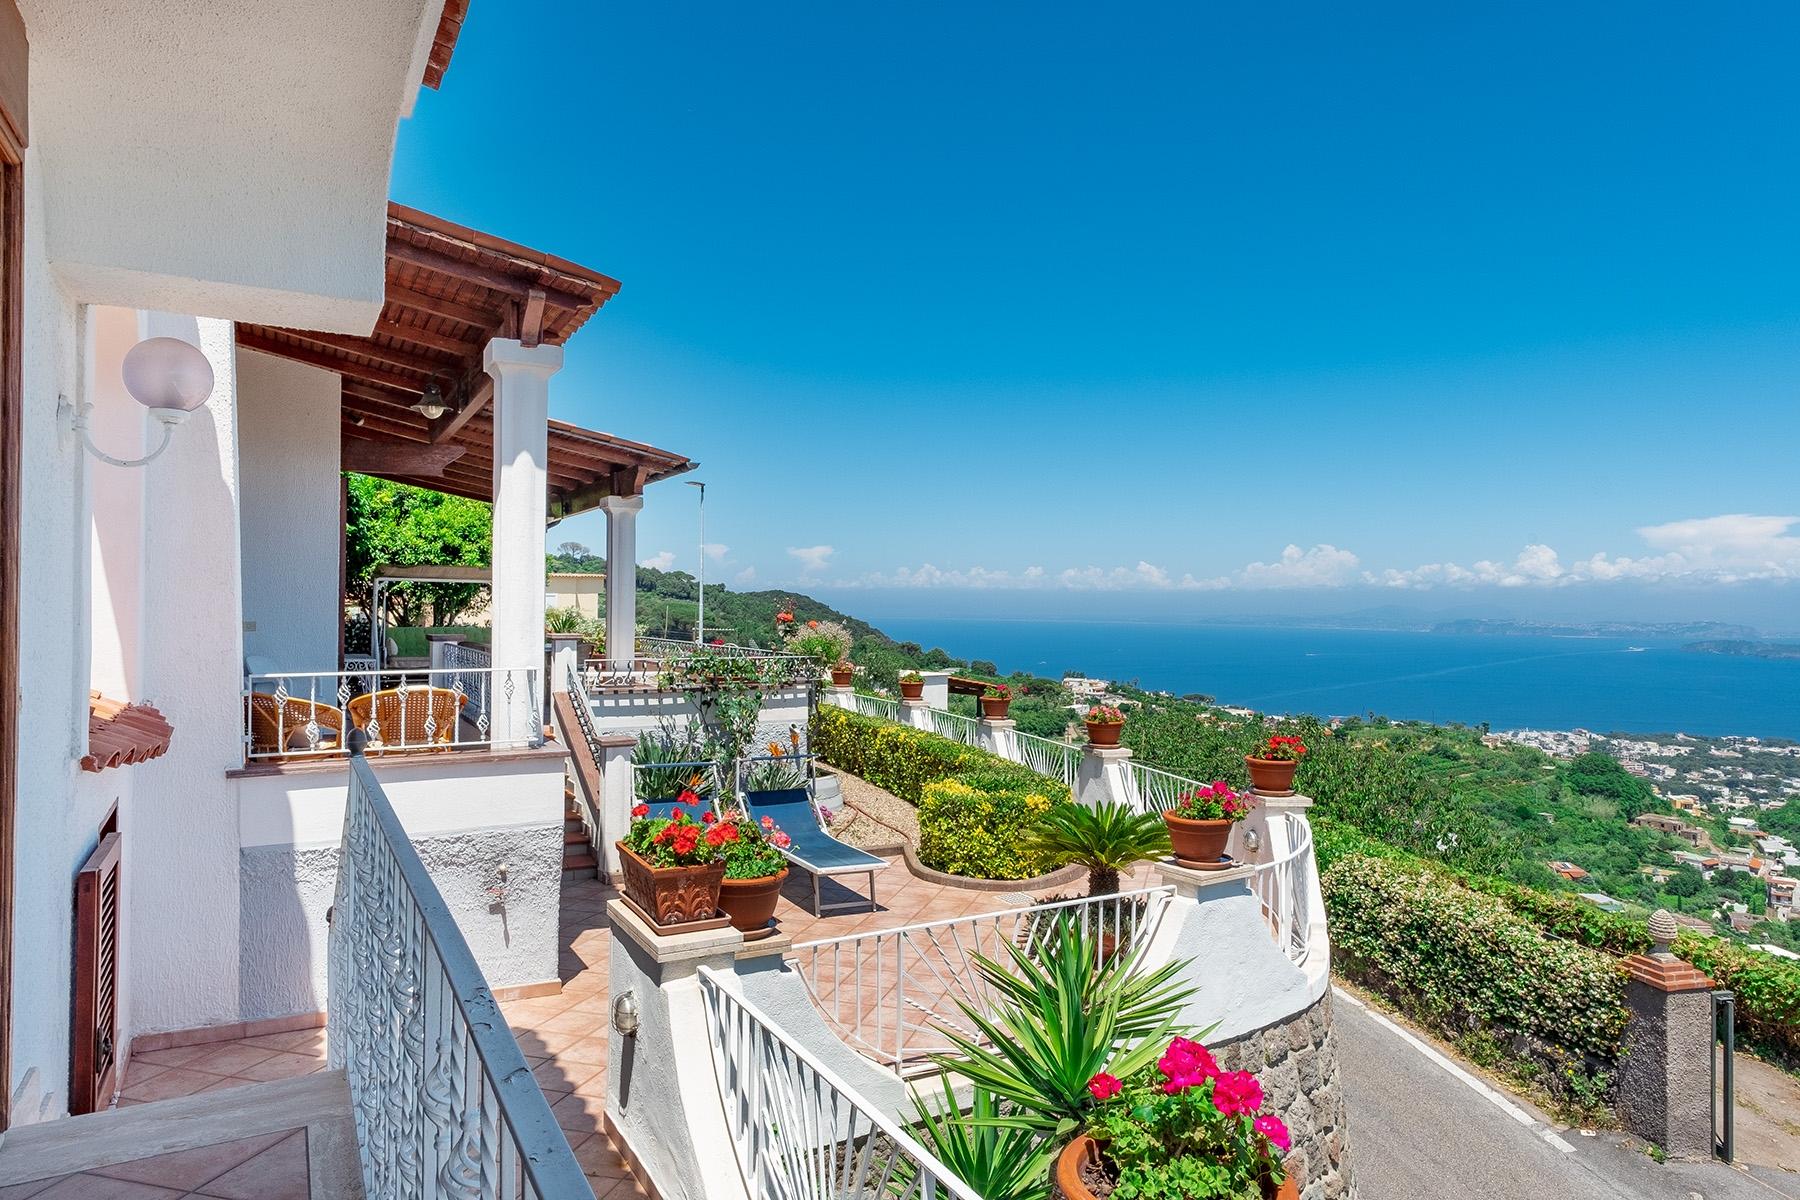 Villa in Vendita a Ischia: 5 locali, 138 mq - Foto 19